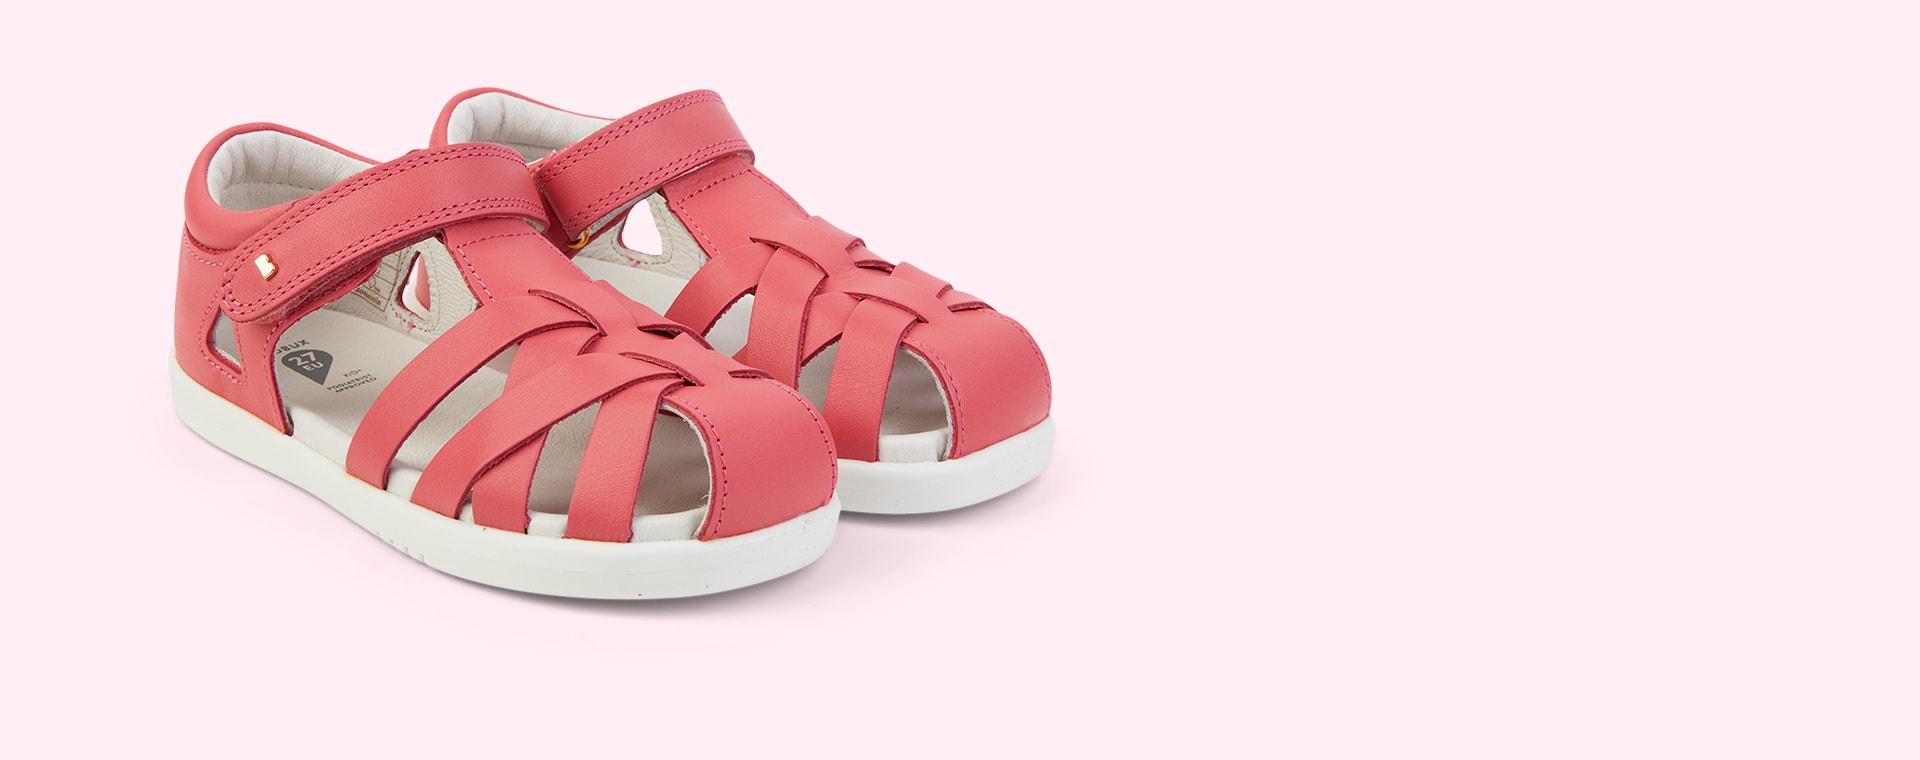 Guava Bobux Kid+ Tropicana Sandal